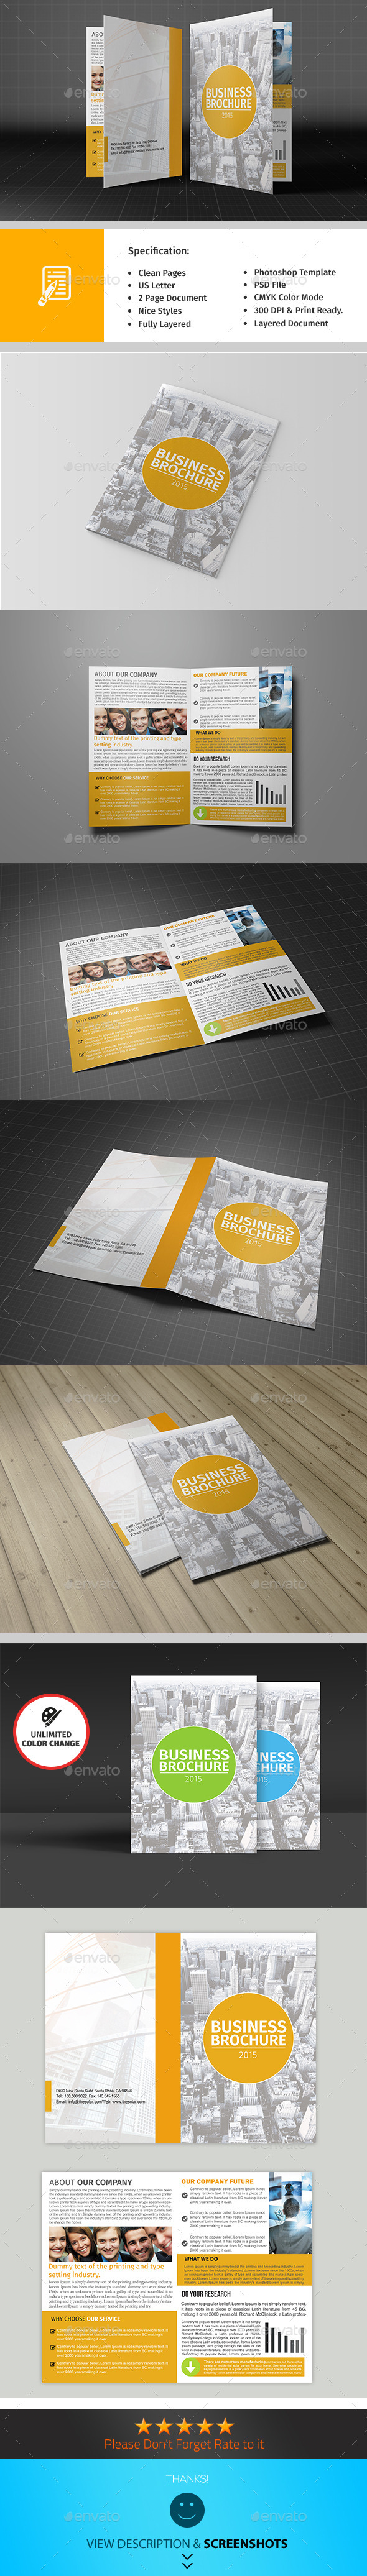 Bifold Corporate Brochure Template Vol03 - Corporate Brochures